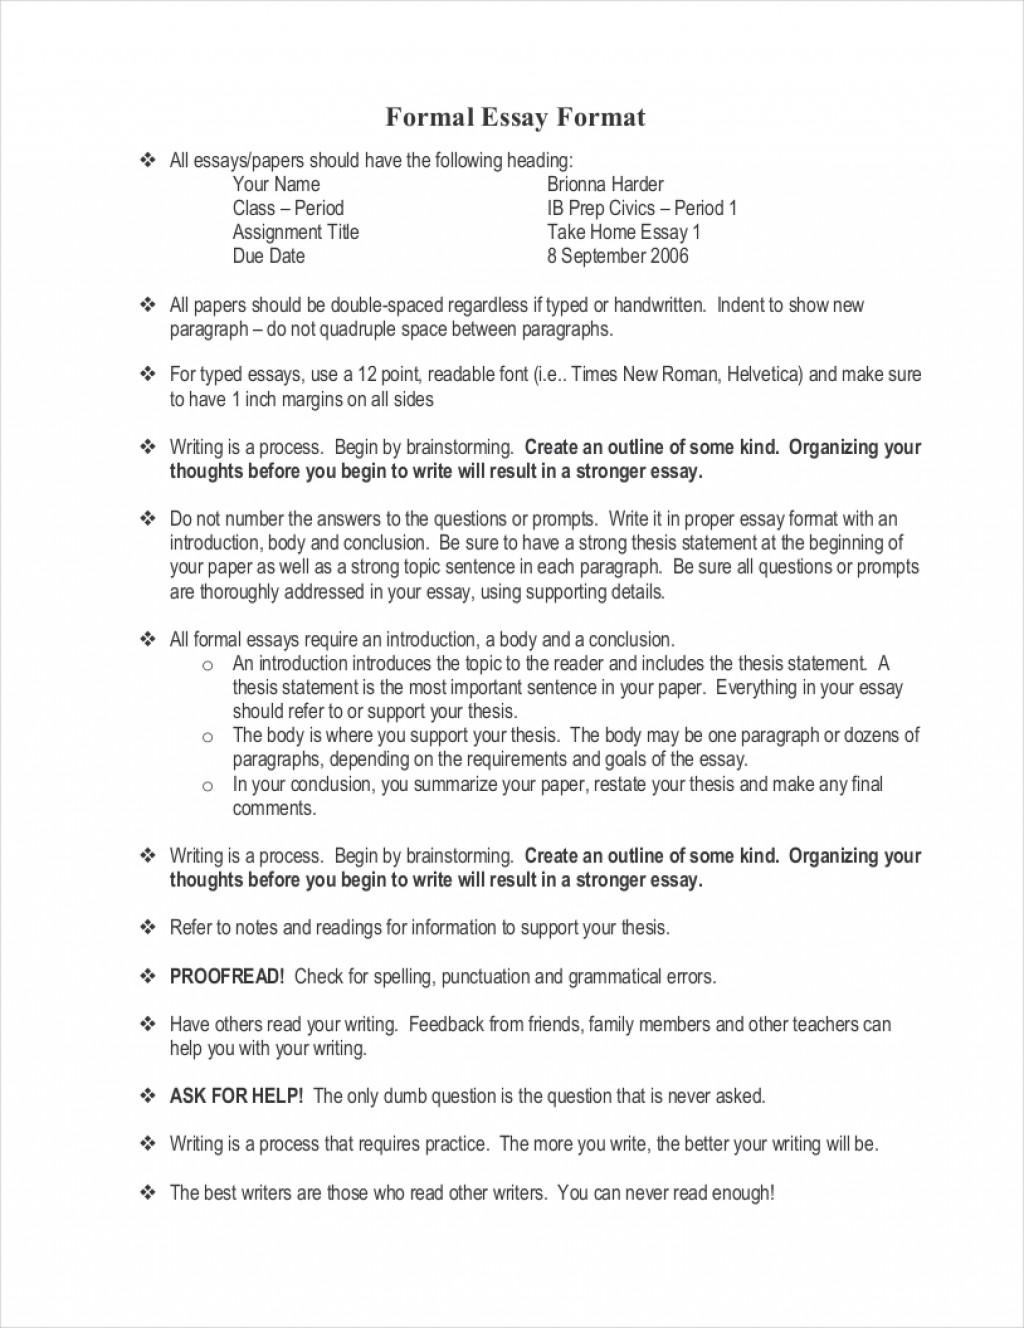 Apa style academic essay